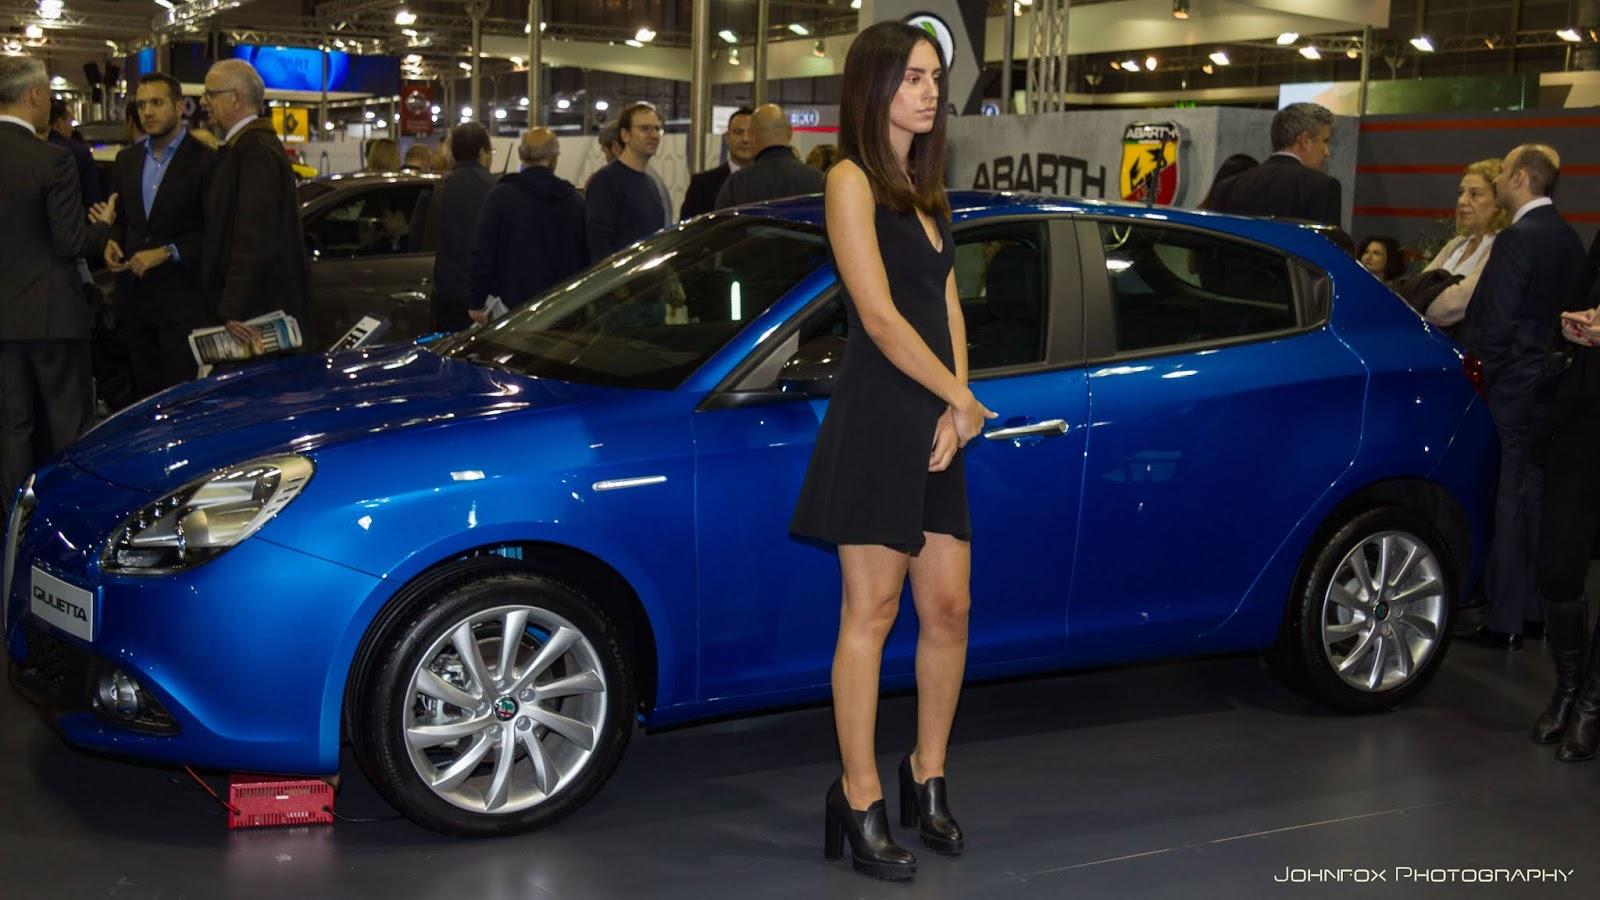 models2B2528192Bof2B232529 Τα κορίτσια της Αυτοκίνησης! Έκθεση, μοντέλα, ΦΩΤΟ, φωτογραφίες